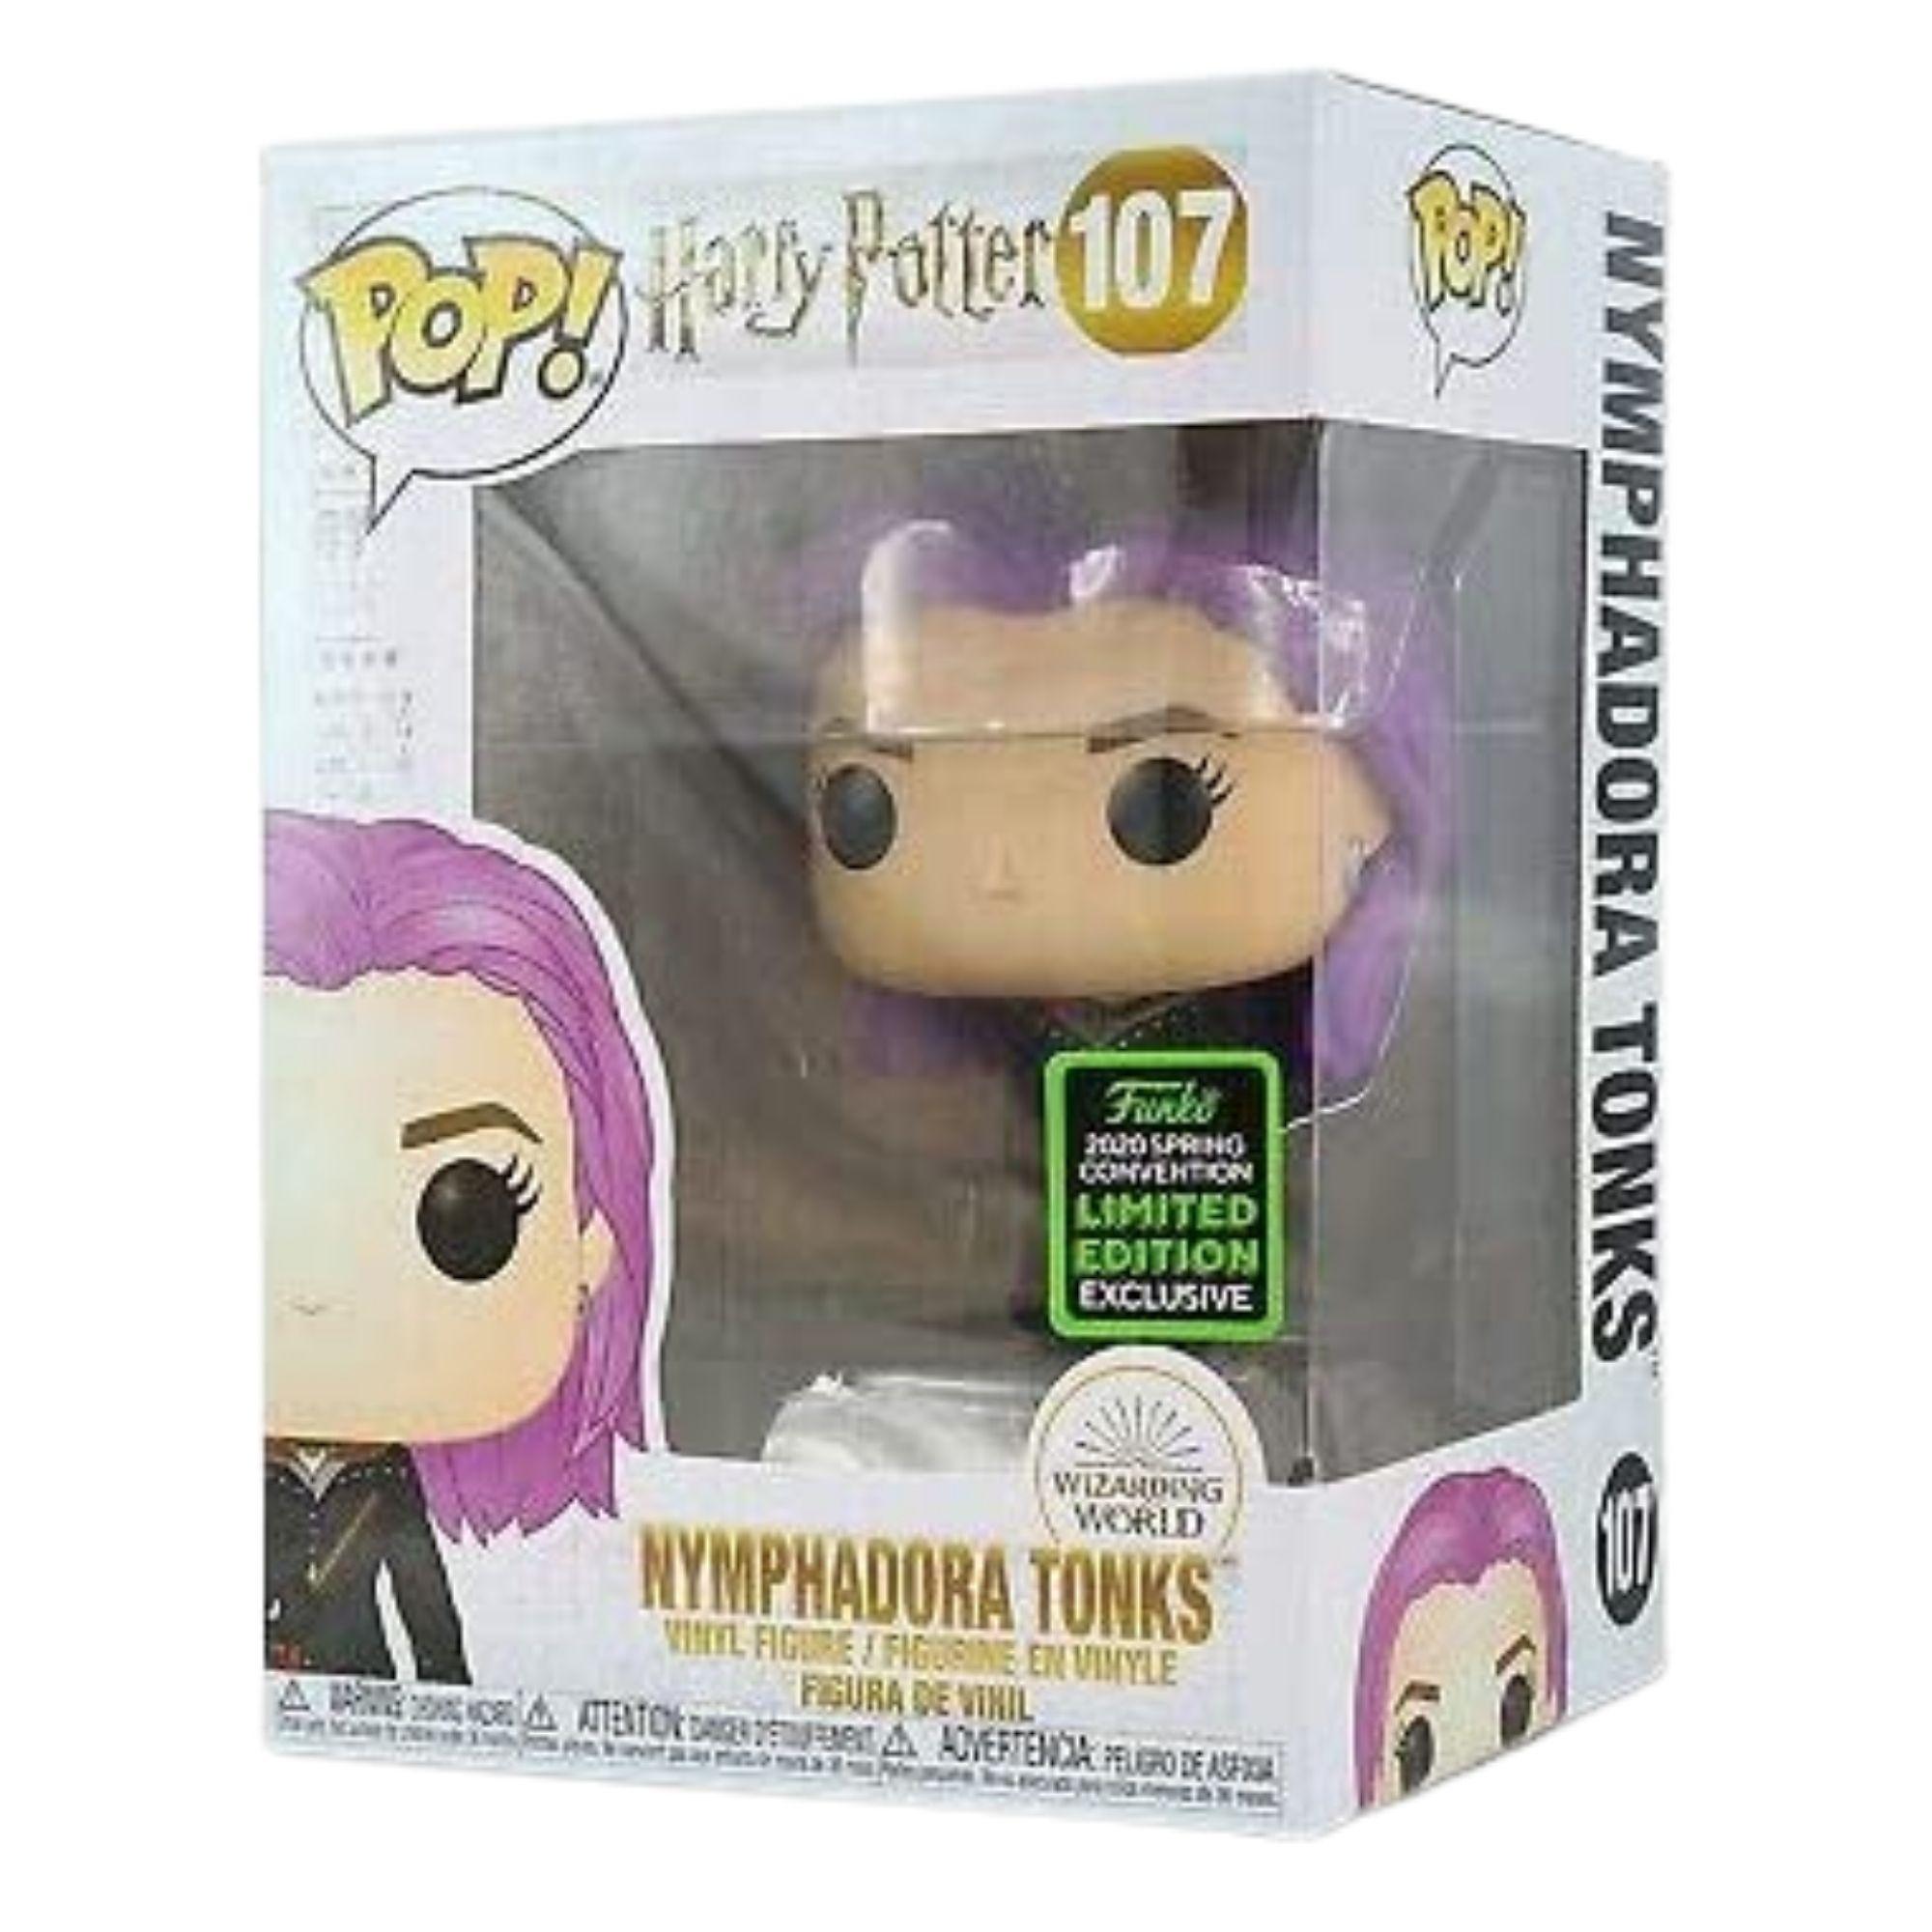 Funko Pop Harry Potter Nymphadora Tonks Eccc 2020 #107  - Game Land Brinquedos